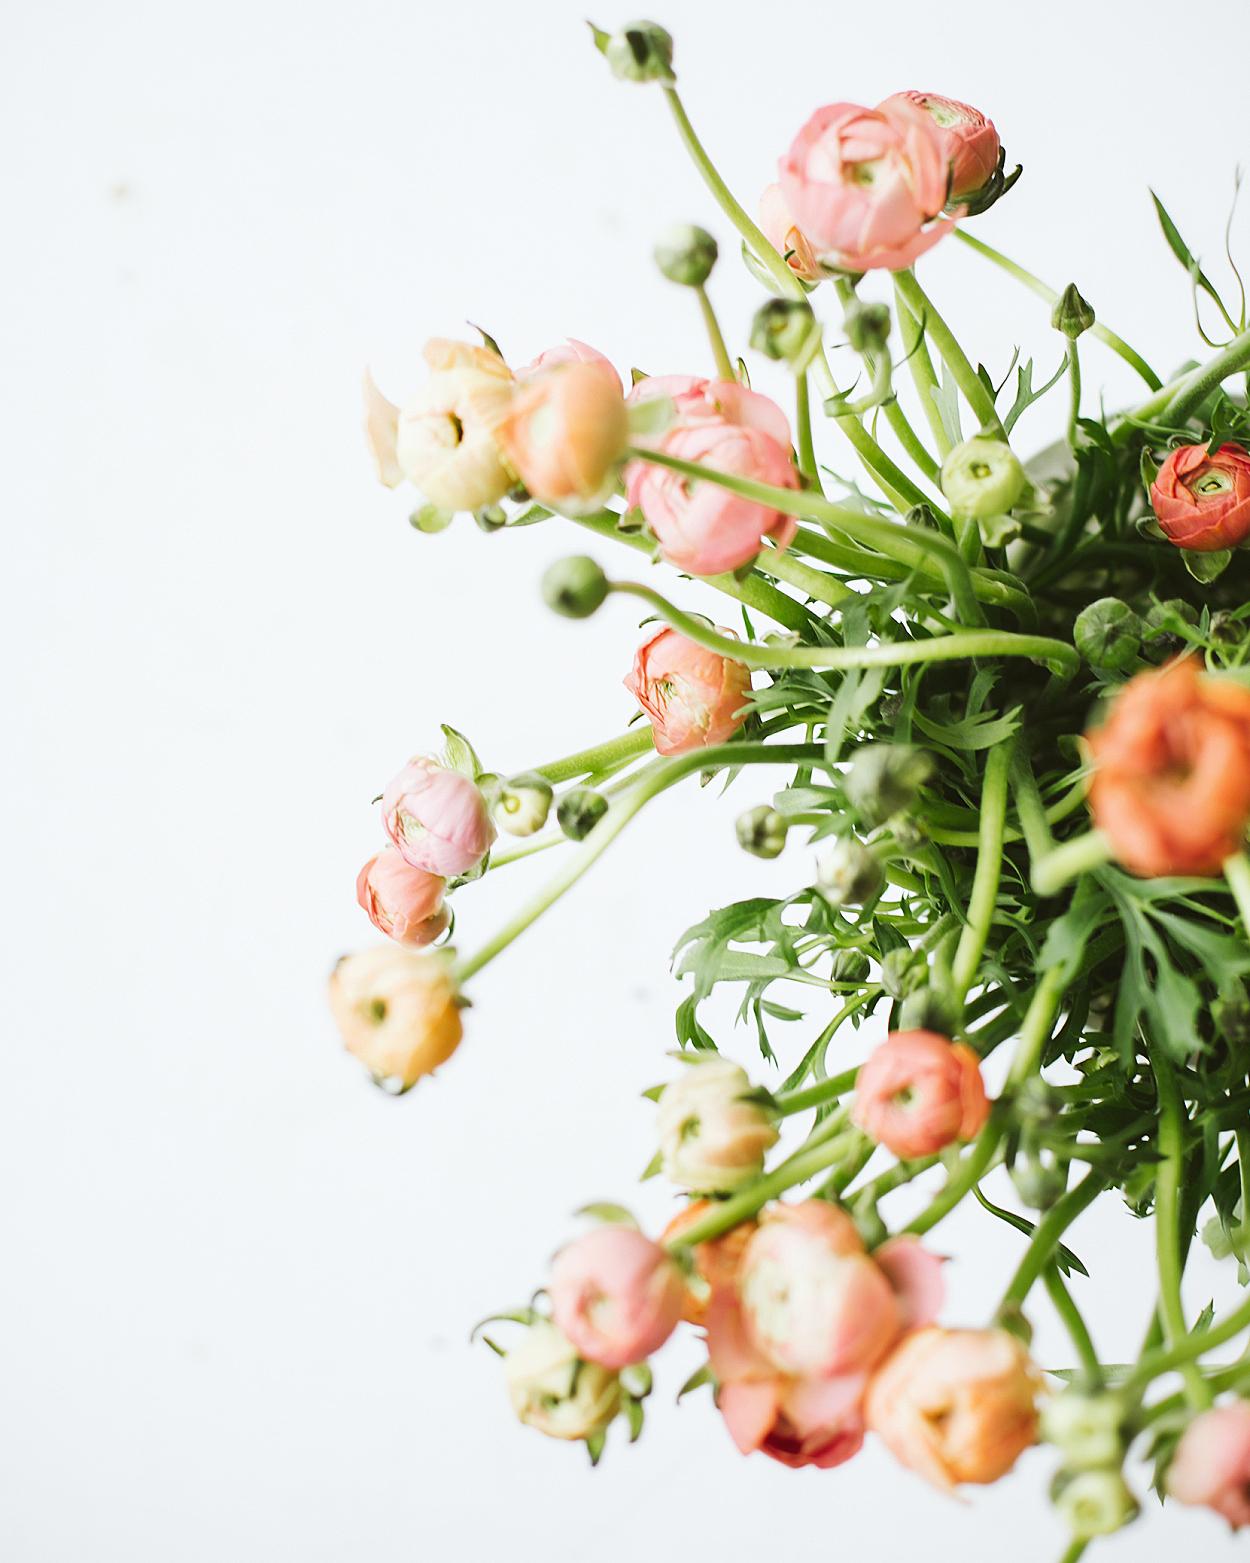 romantic-wedding-flowers-ranunculus-0516.jpg